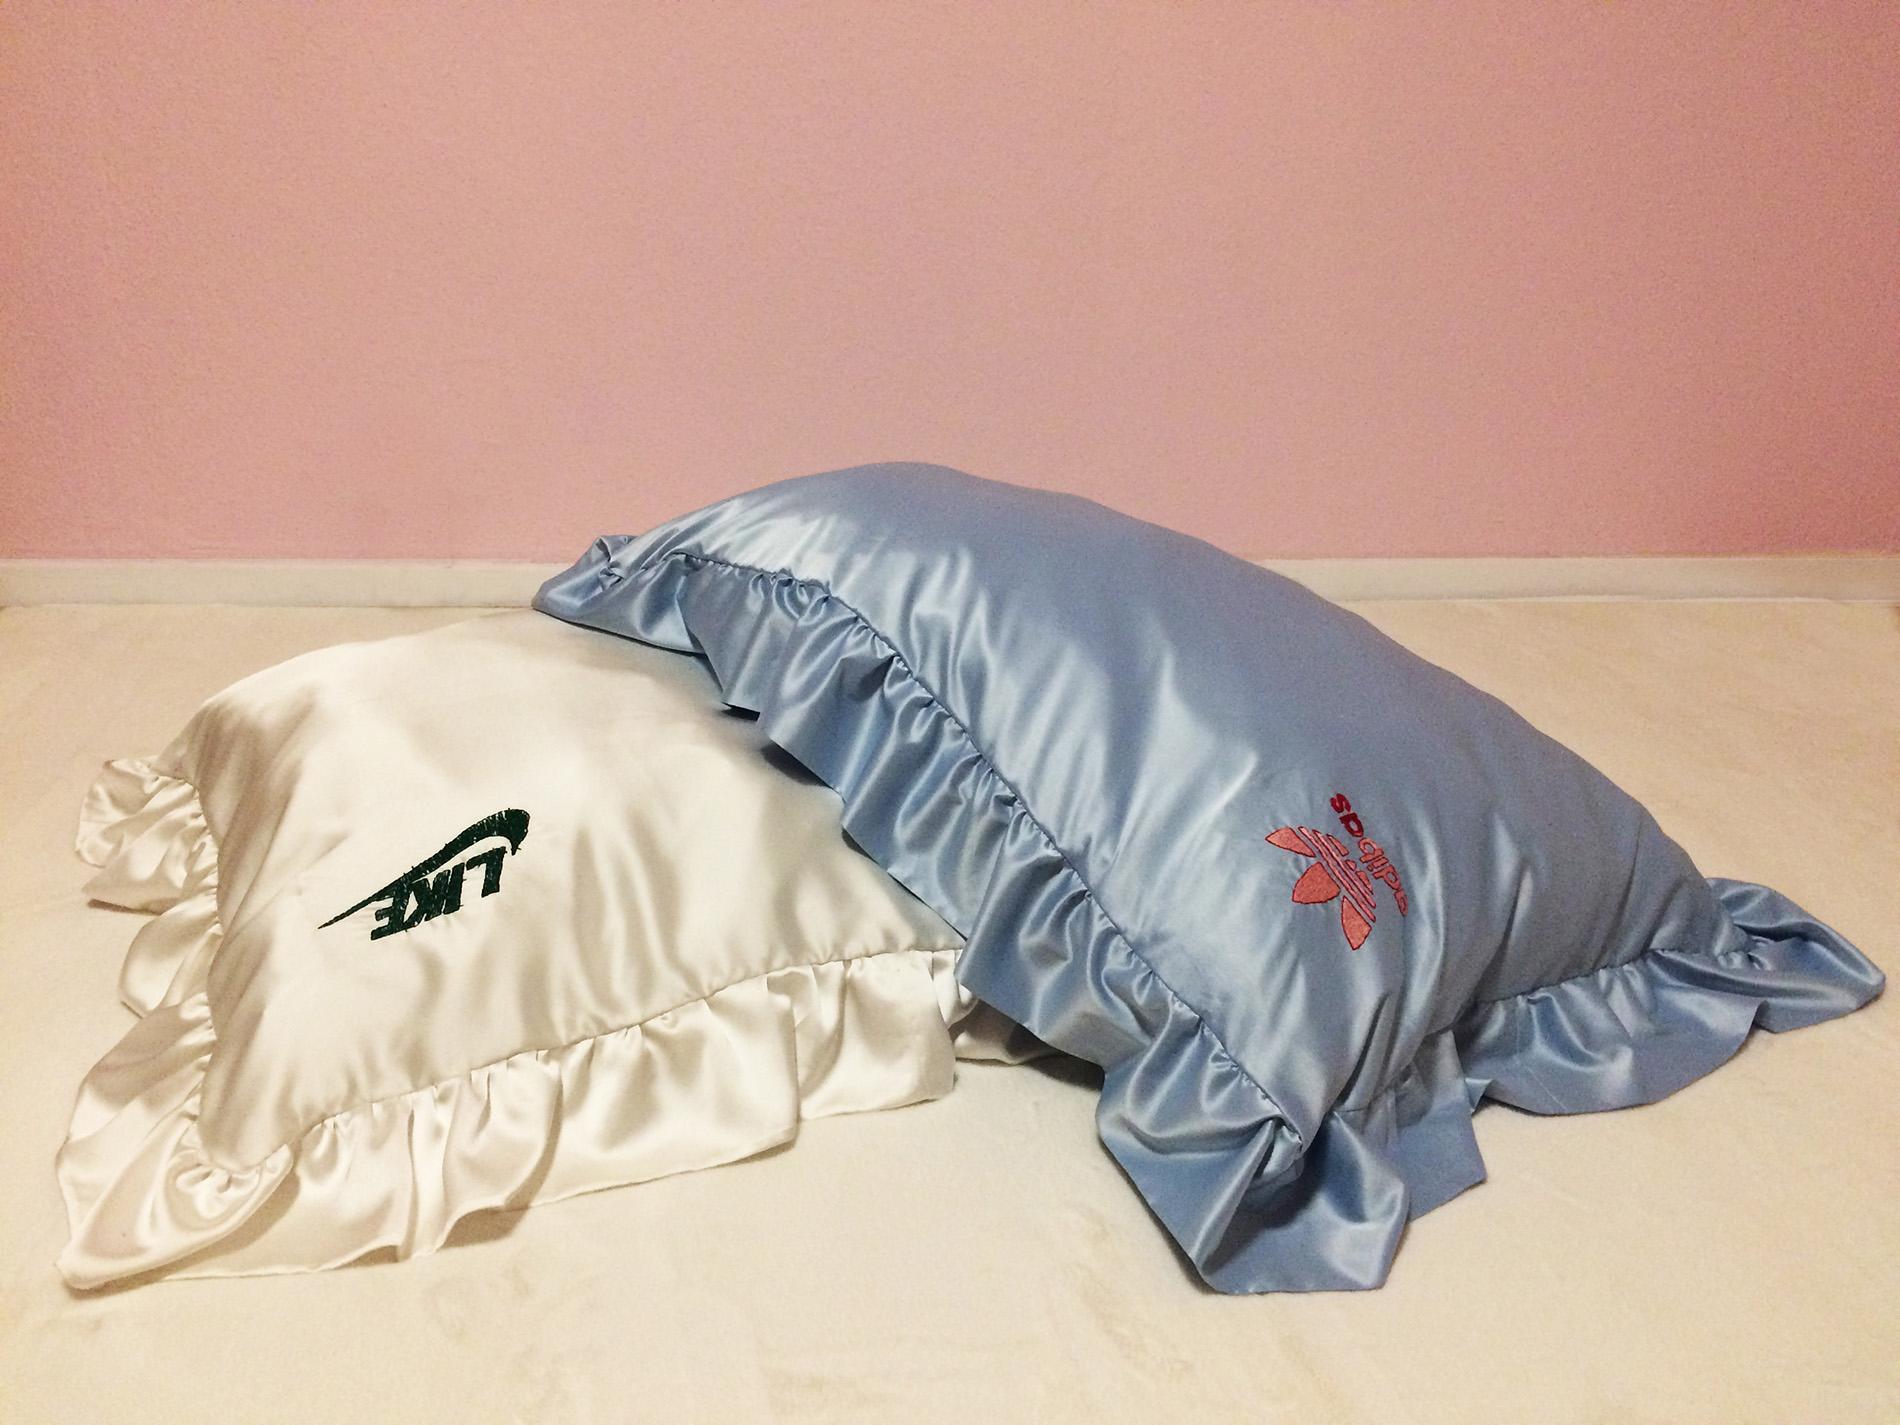 Victoria Parvanova | Pillow Fight 2020